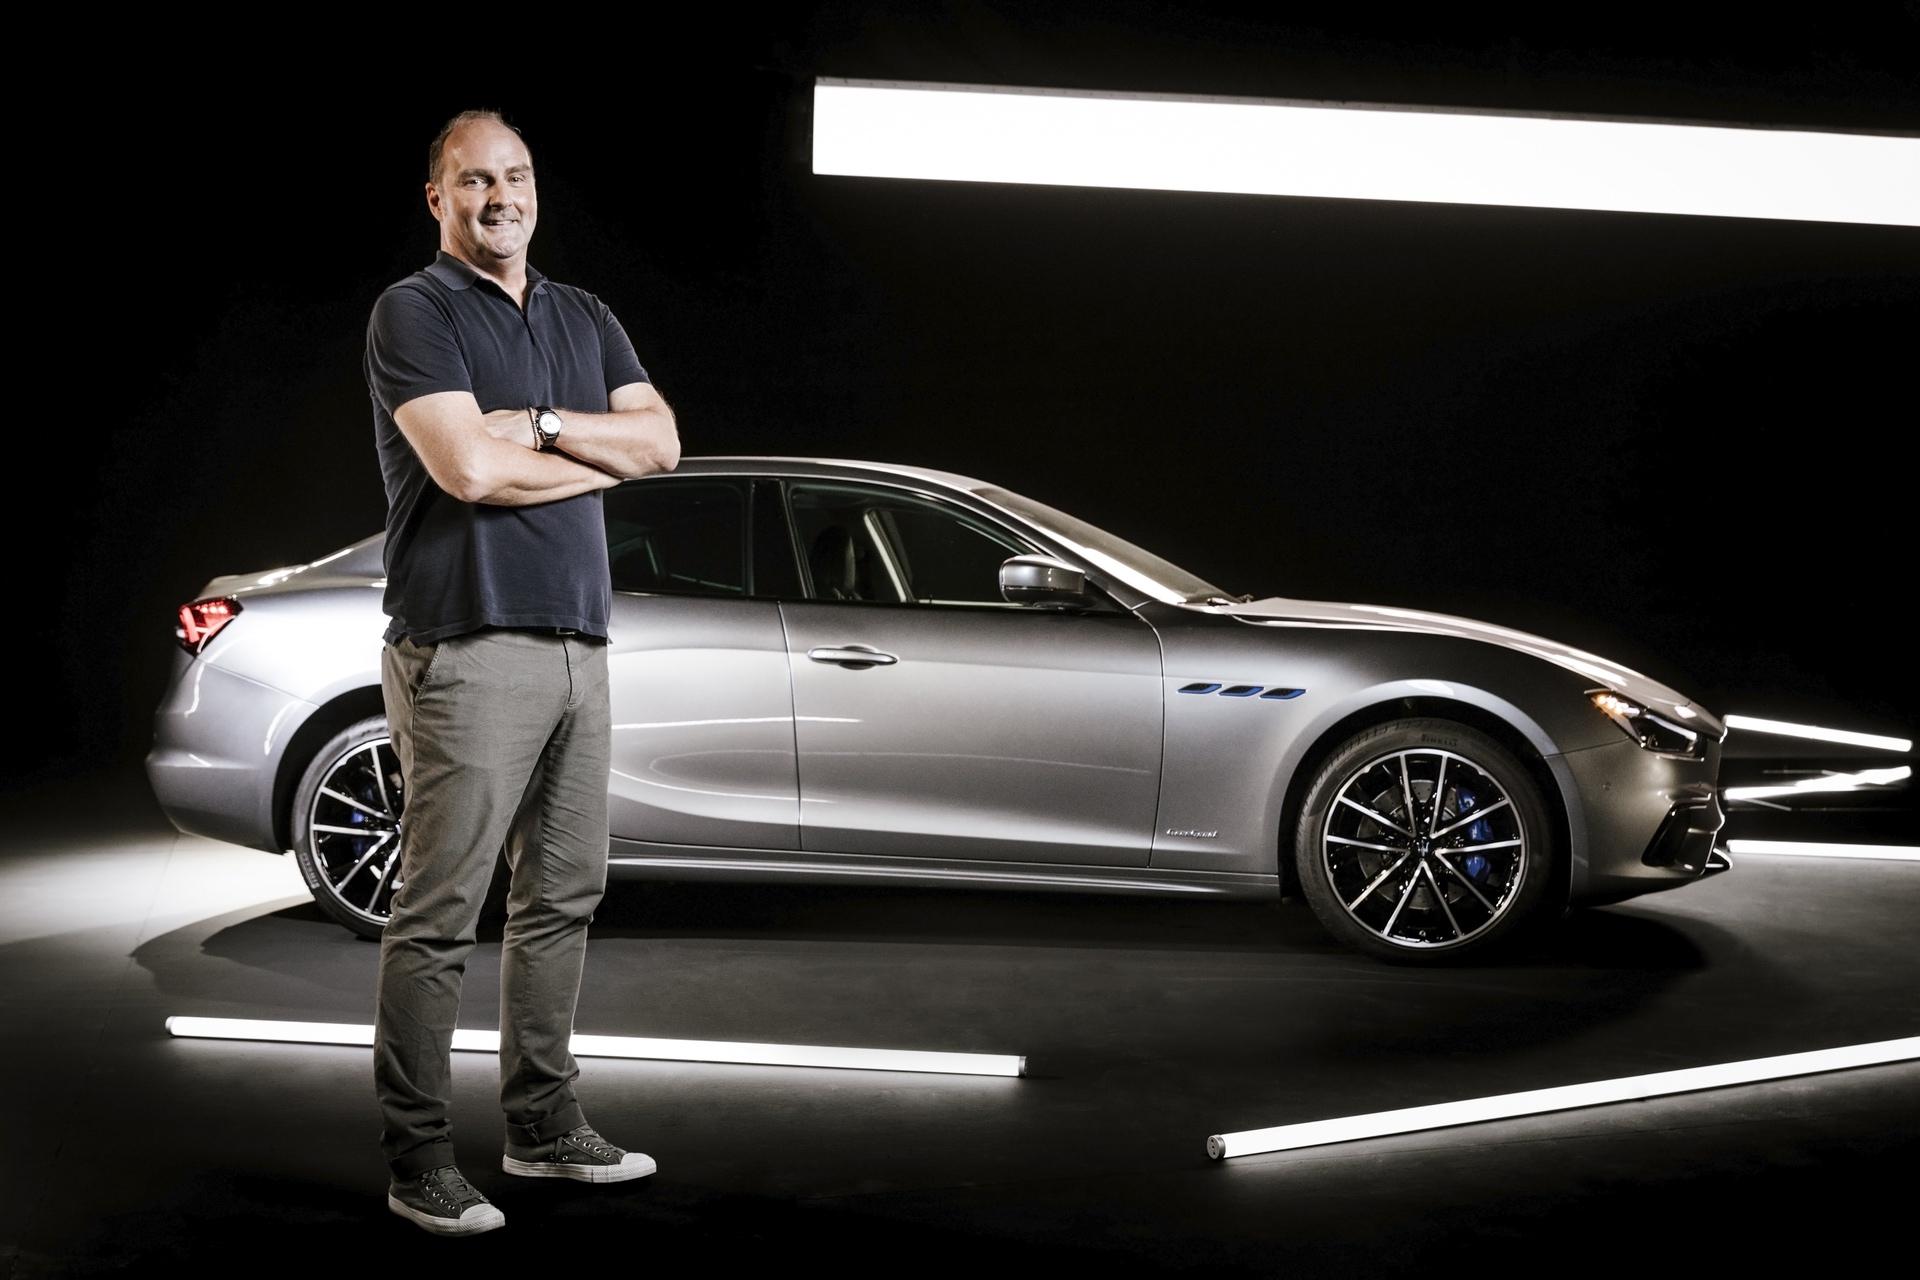 14_TheoJansen-MaseratiHeadofe-MobilityandConnectivity